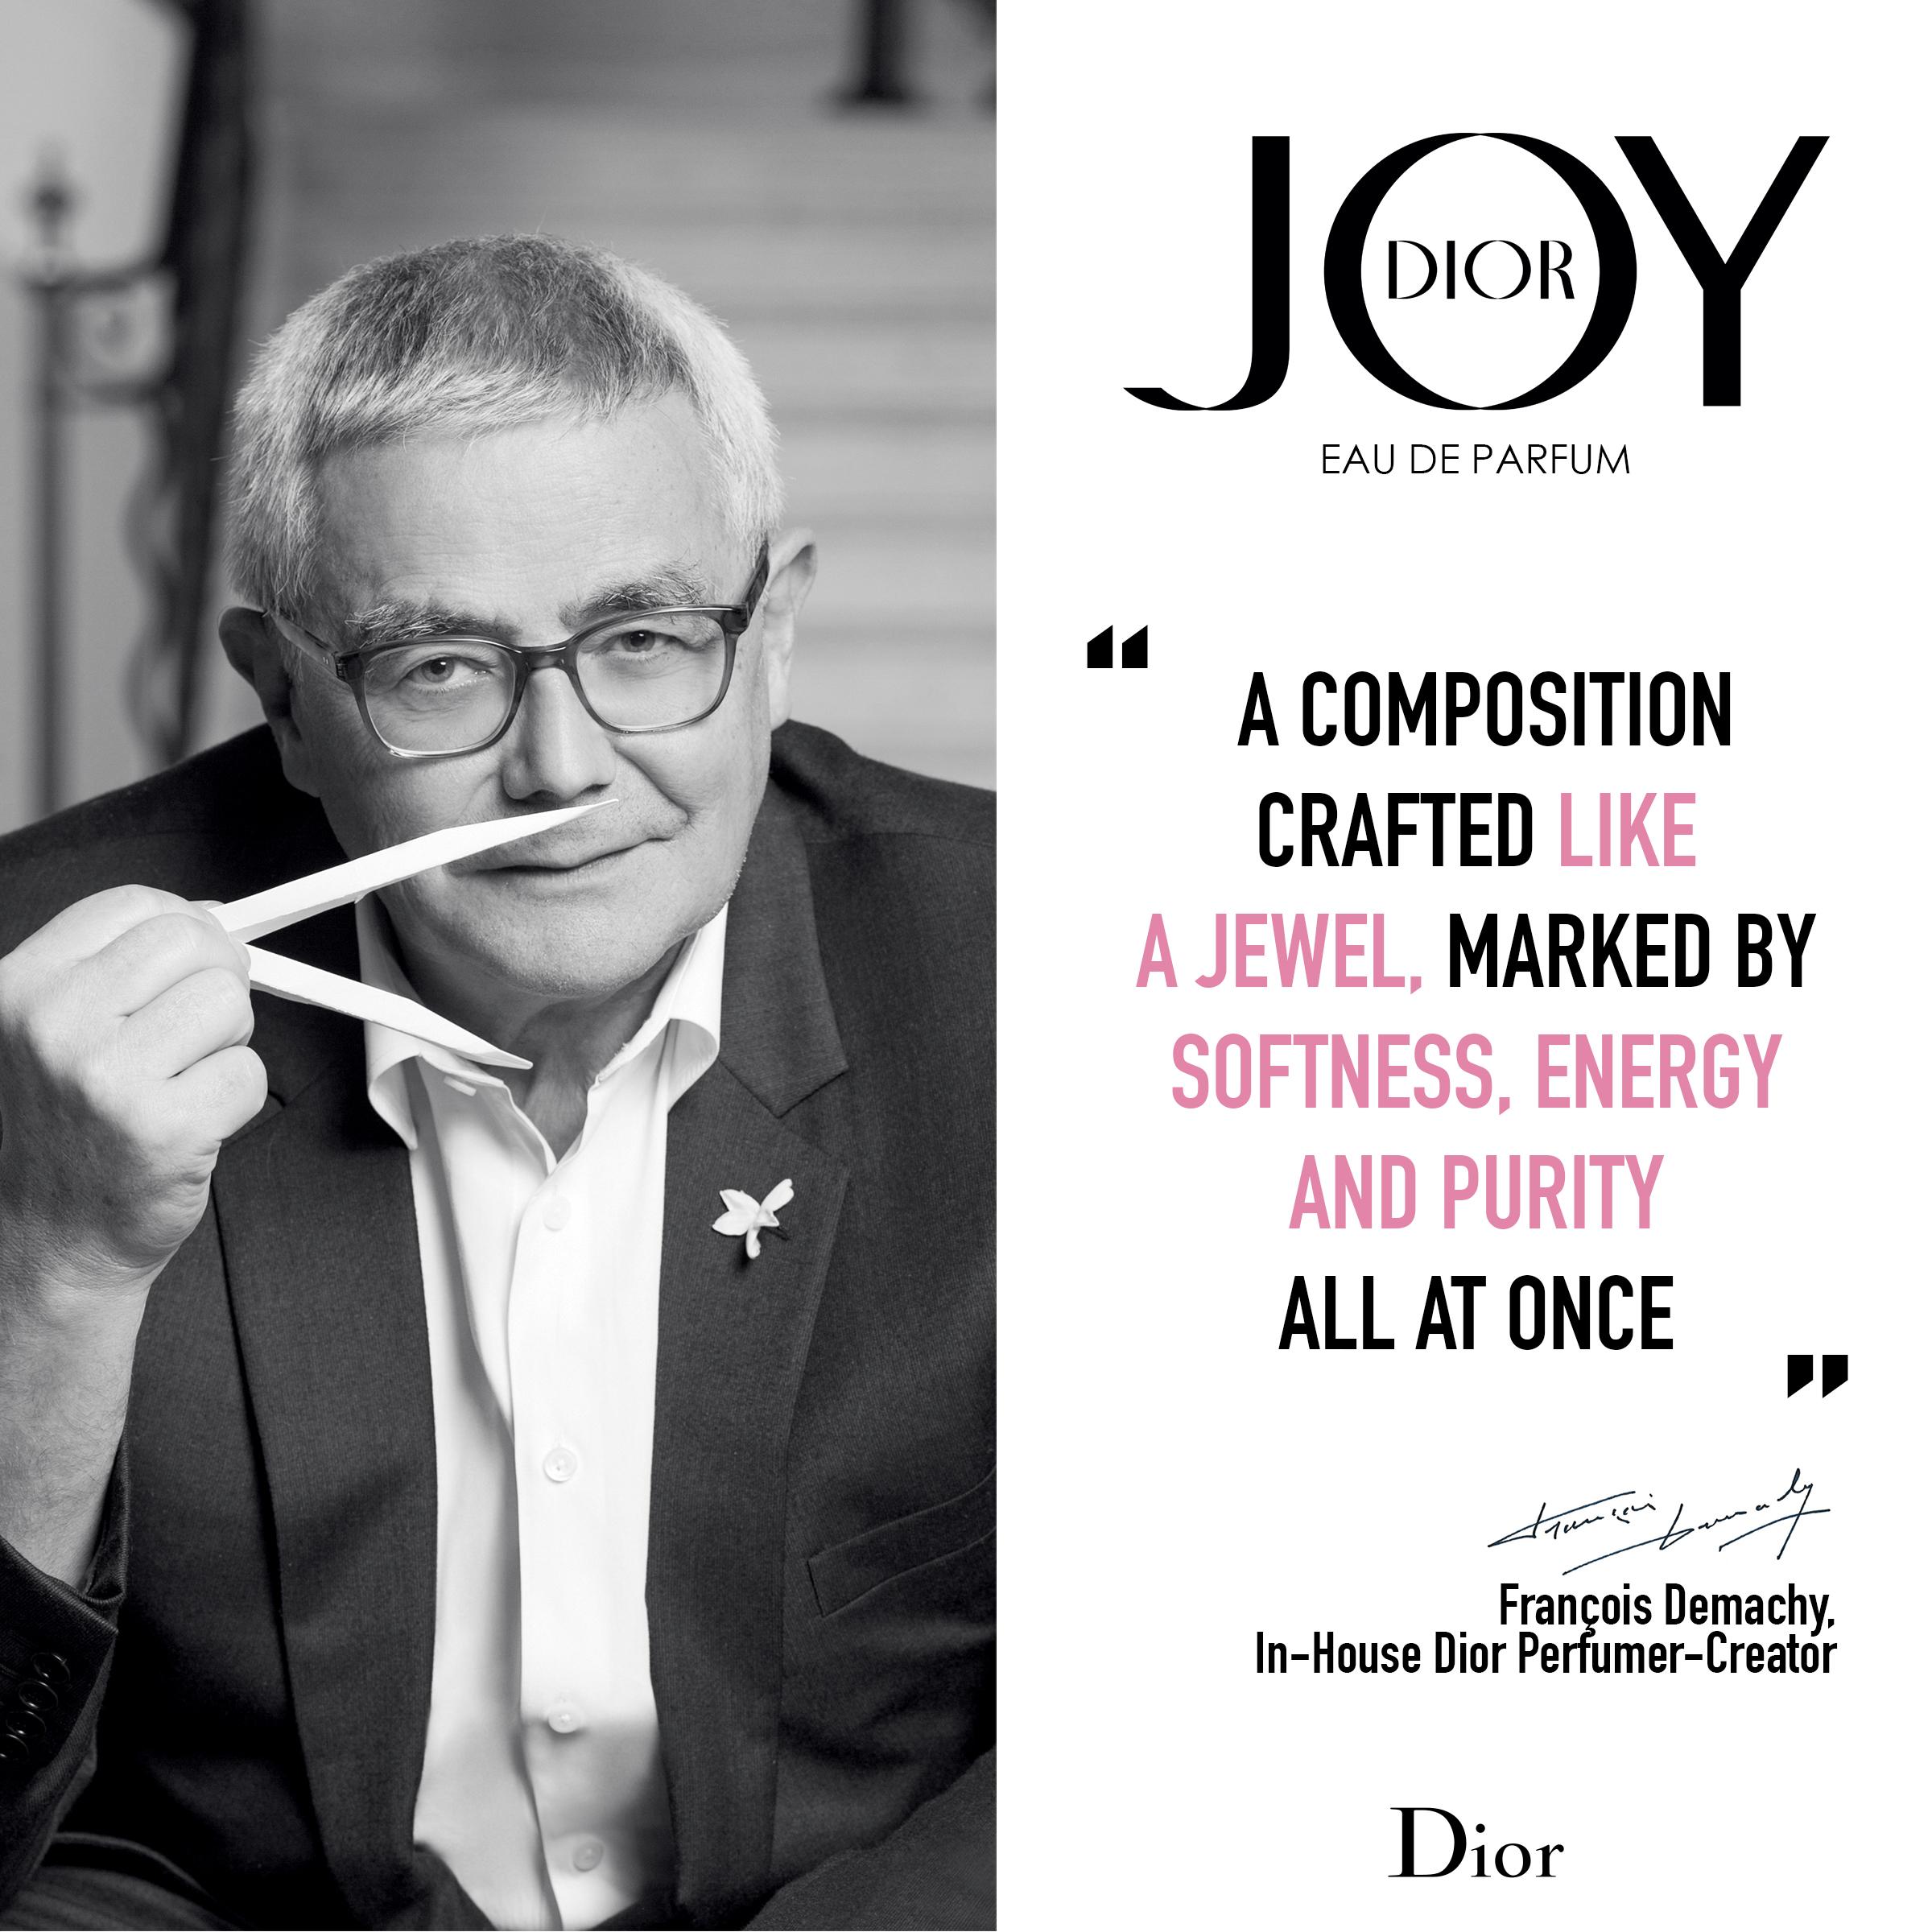 DIOR JOY by Dior Eau de Parfum, 30 ml